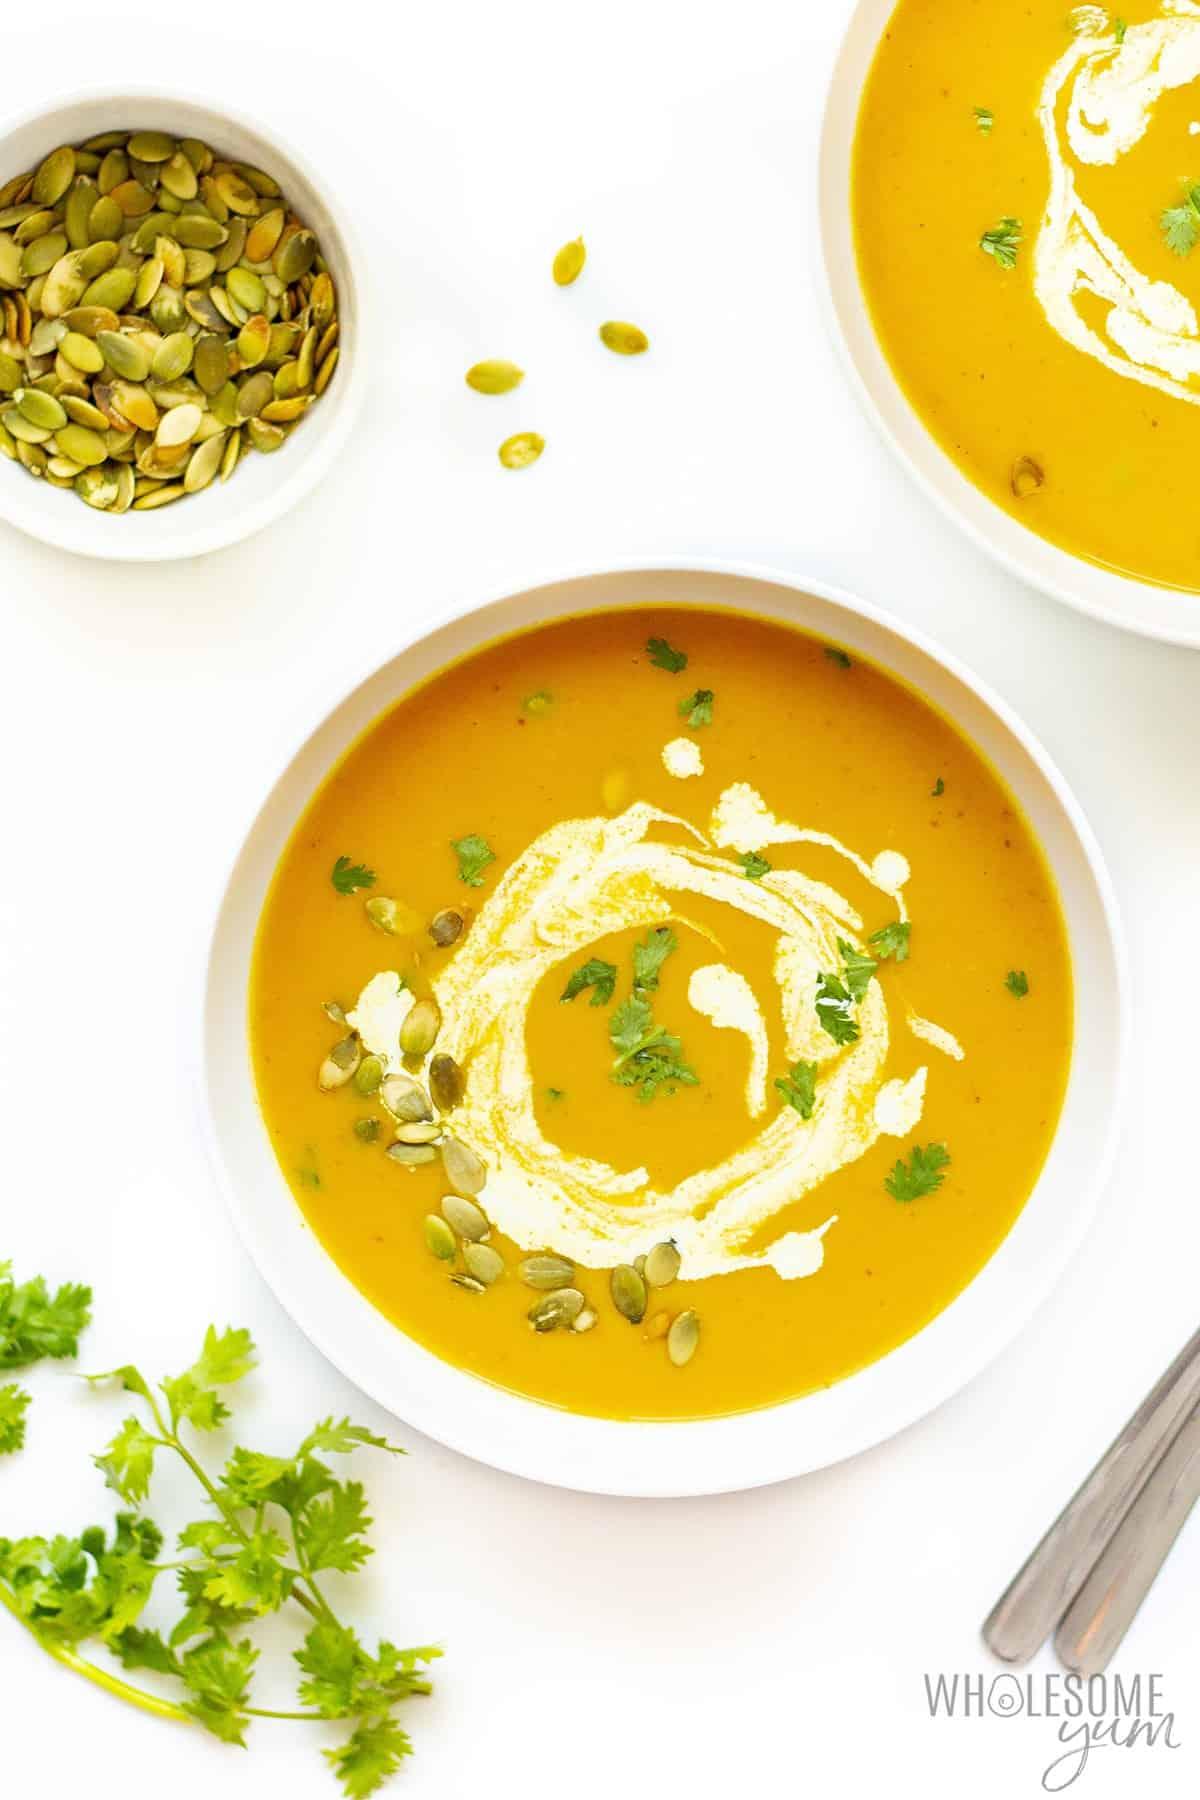 Bowls of pumpkin soup with garnish